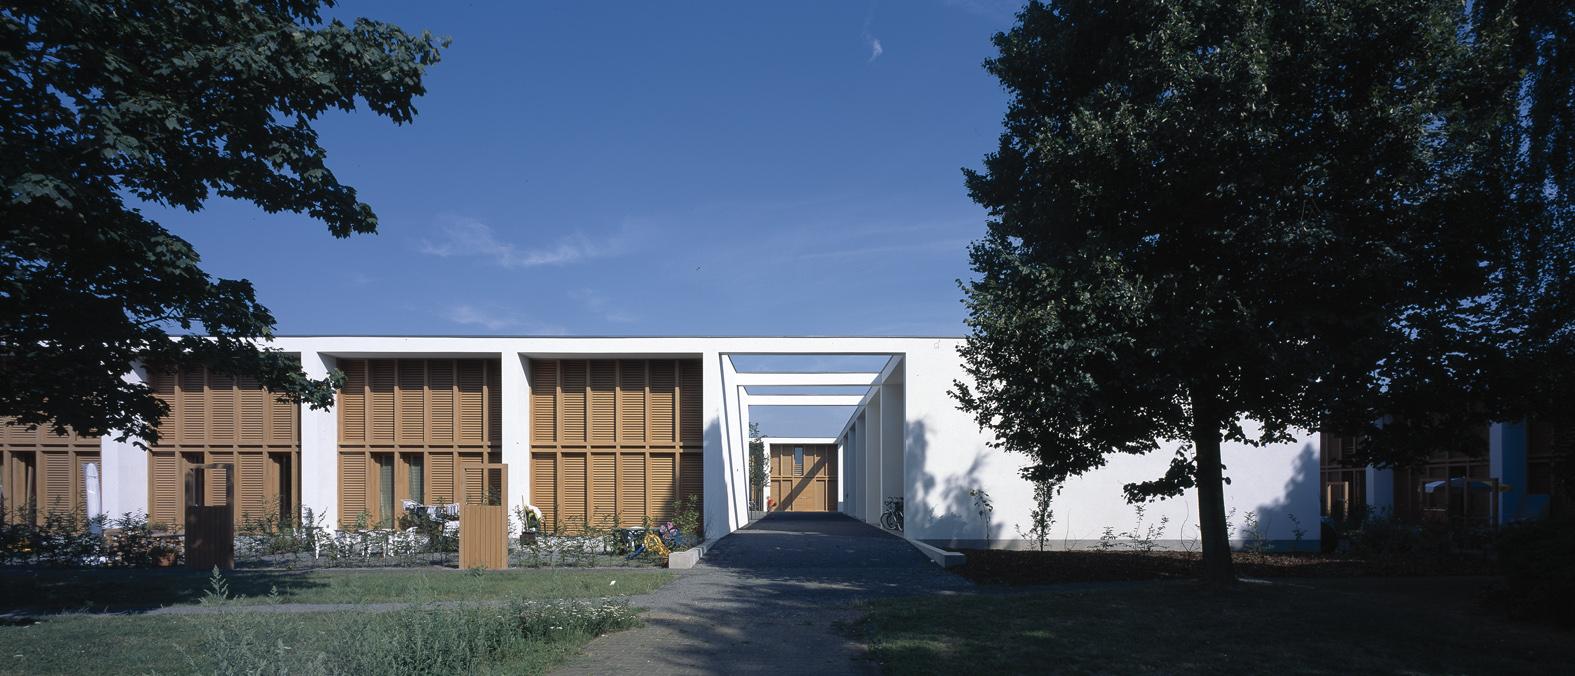 usarch - Wohnhöfe Auerberg